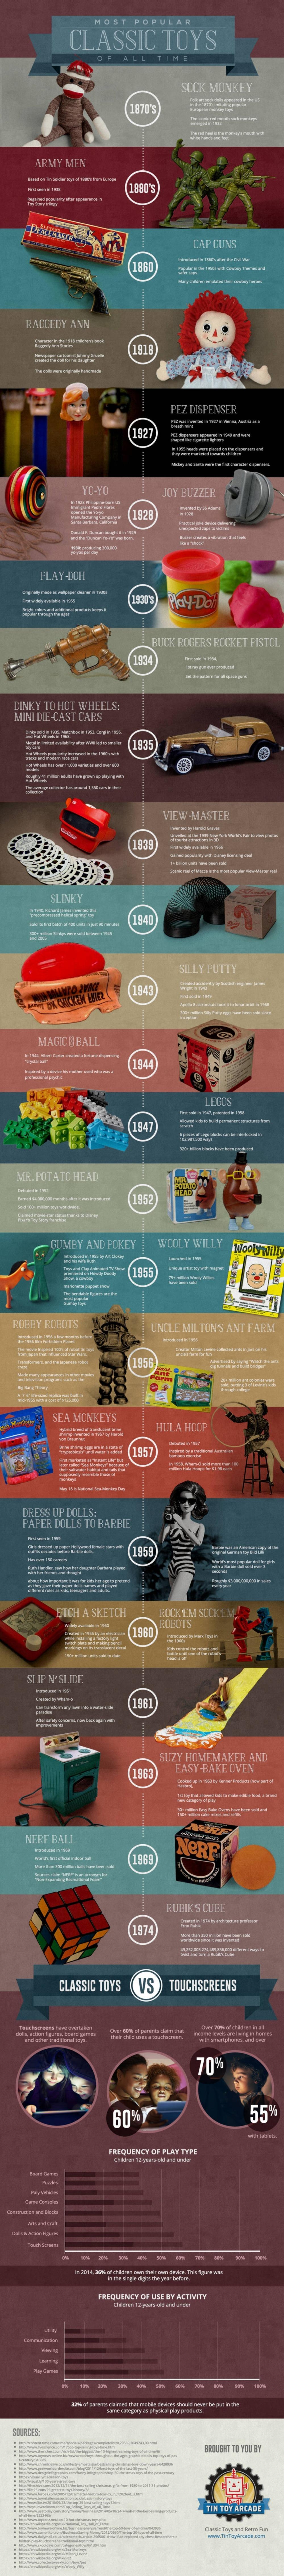 most-popular-classic-toys-2sb2